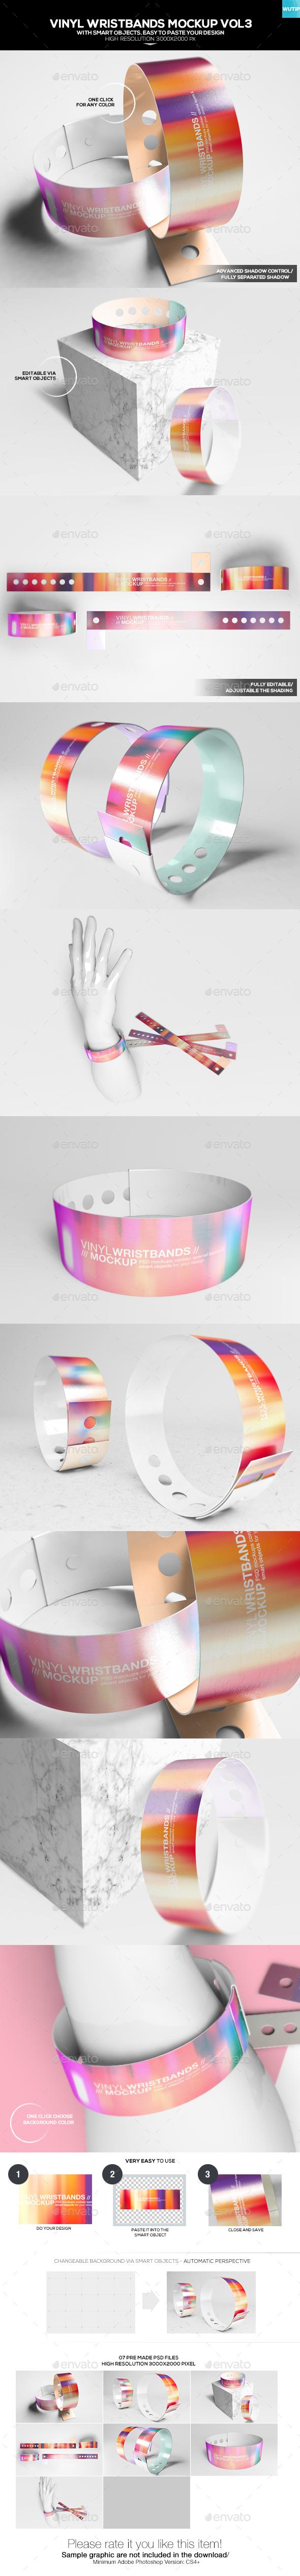 Vinyl Wristbands Mockup Vol3 - Miscellaneous Product Mock-Ups